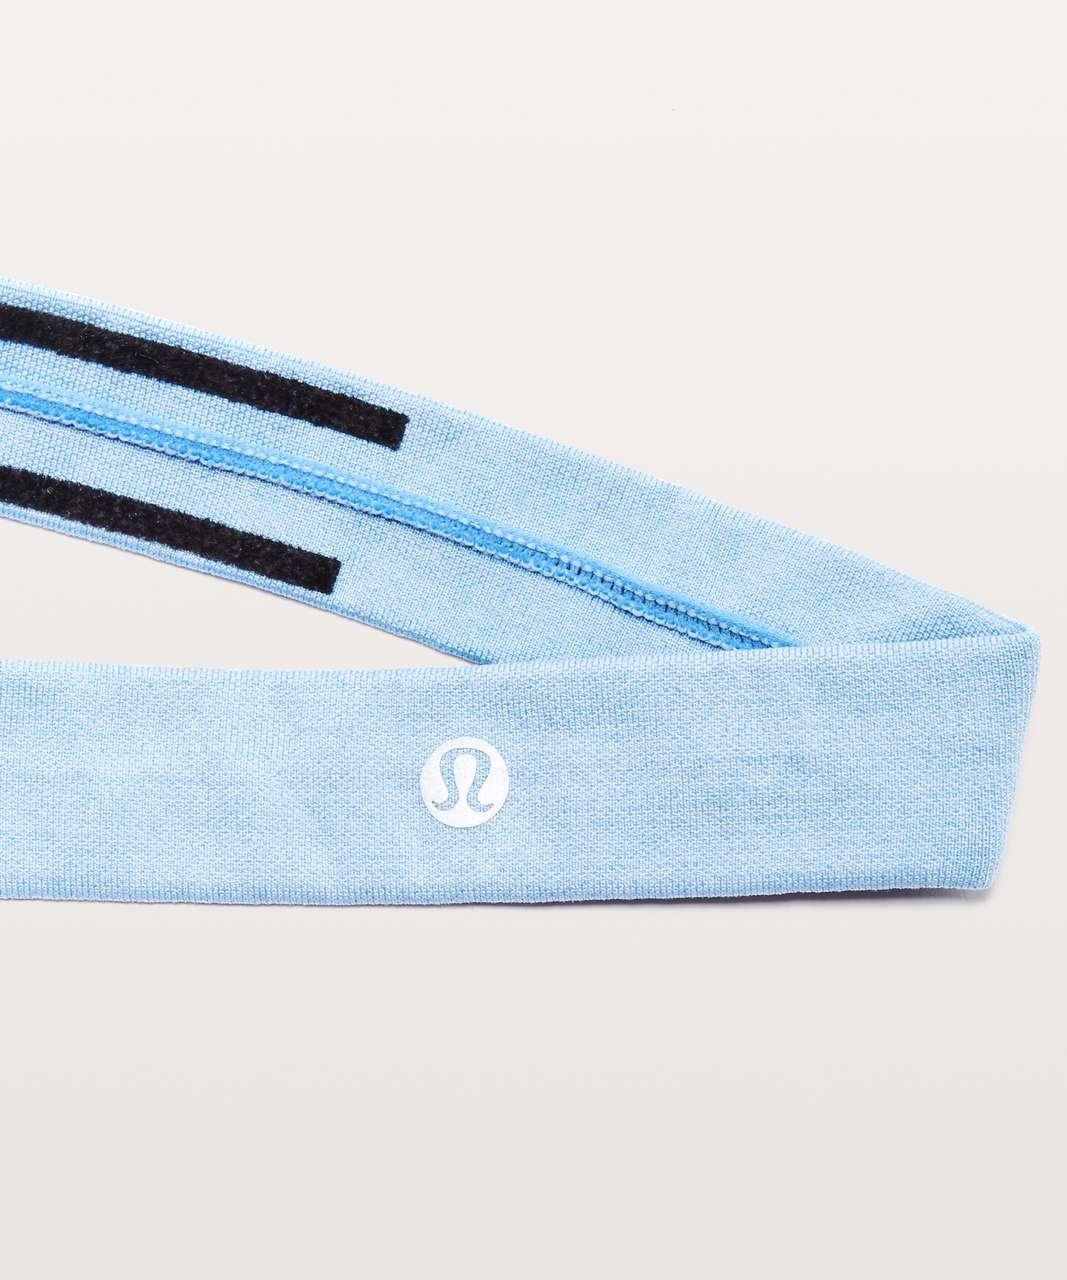 Lululemon Cardio Cross Trainer Headband - Sinatra Blue / White